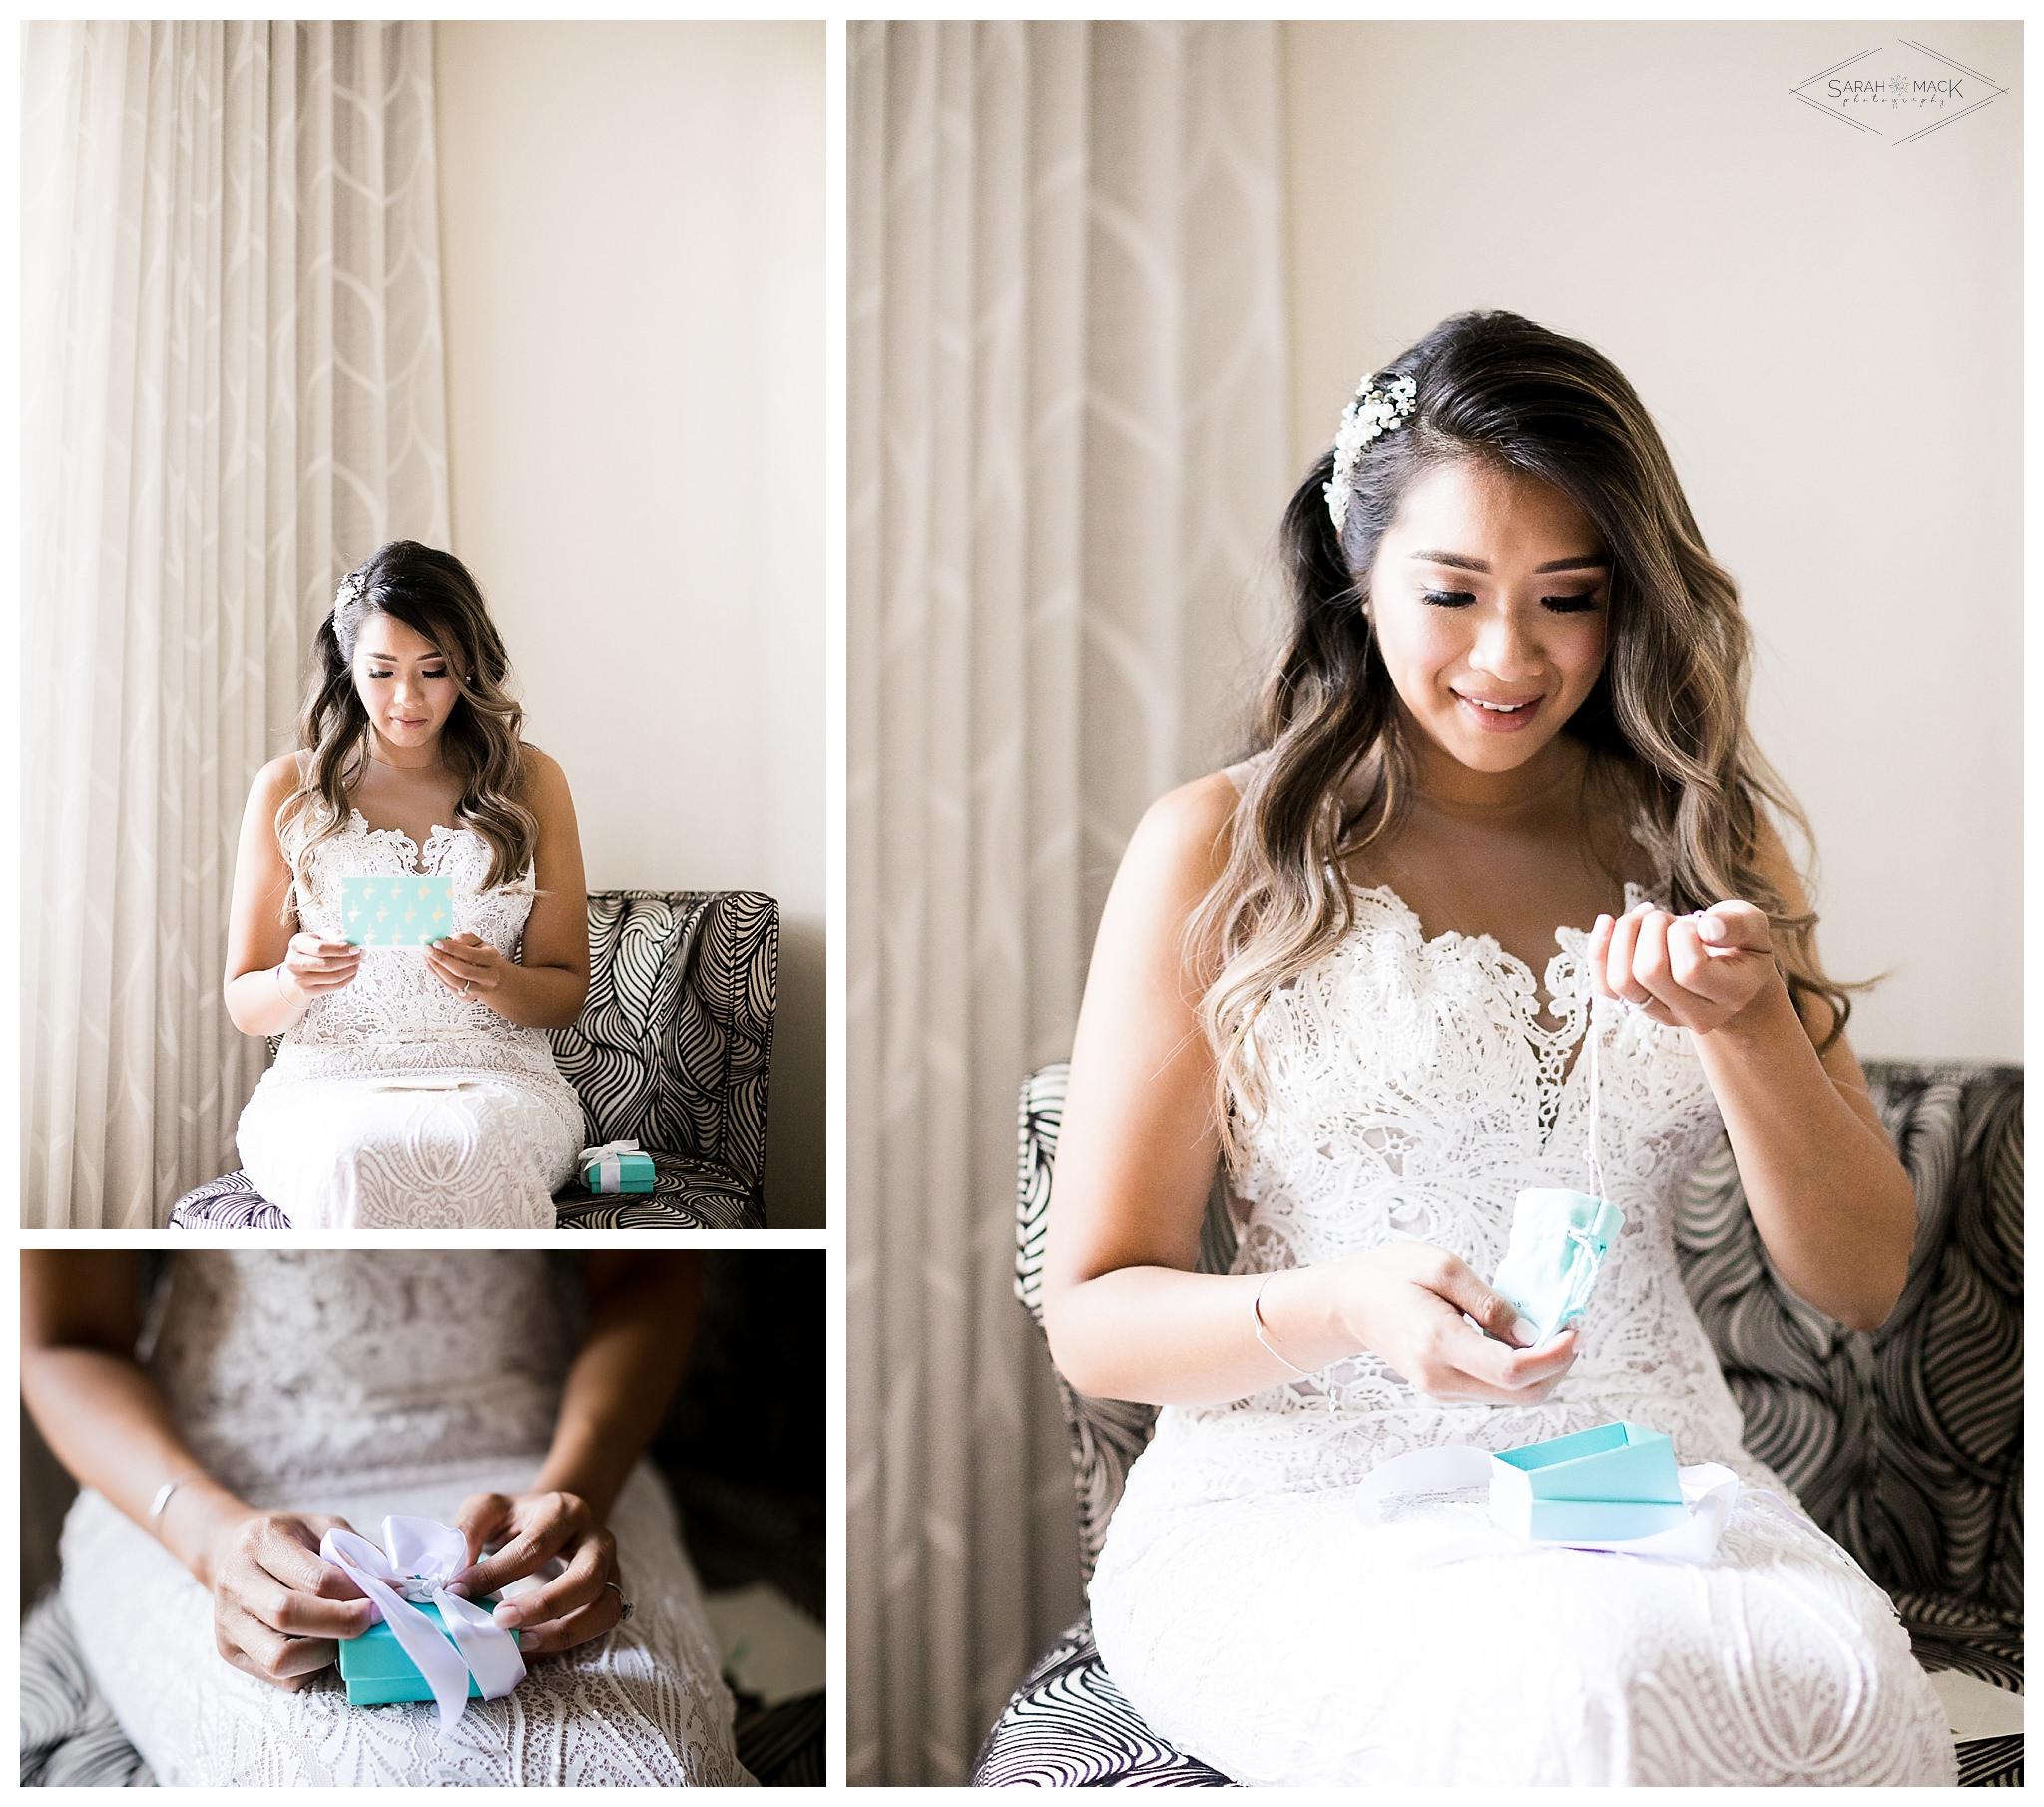 LE-Avenue-of-the-Arts-Costa-Mesa-Wedding-Photography-0052.jpg